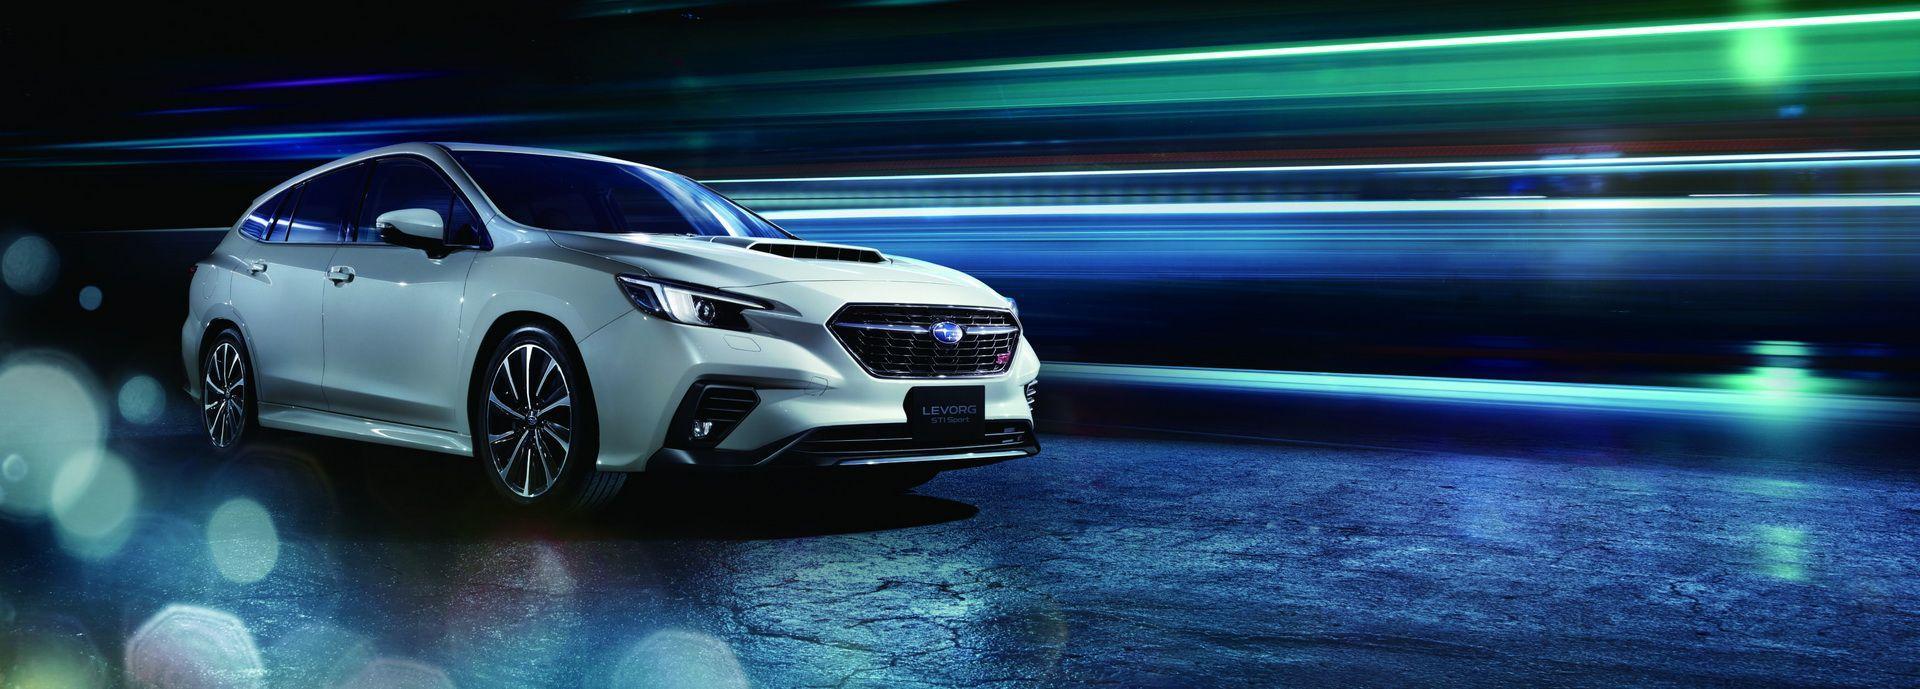 2021_Subaru_Levorg_0089